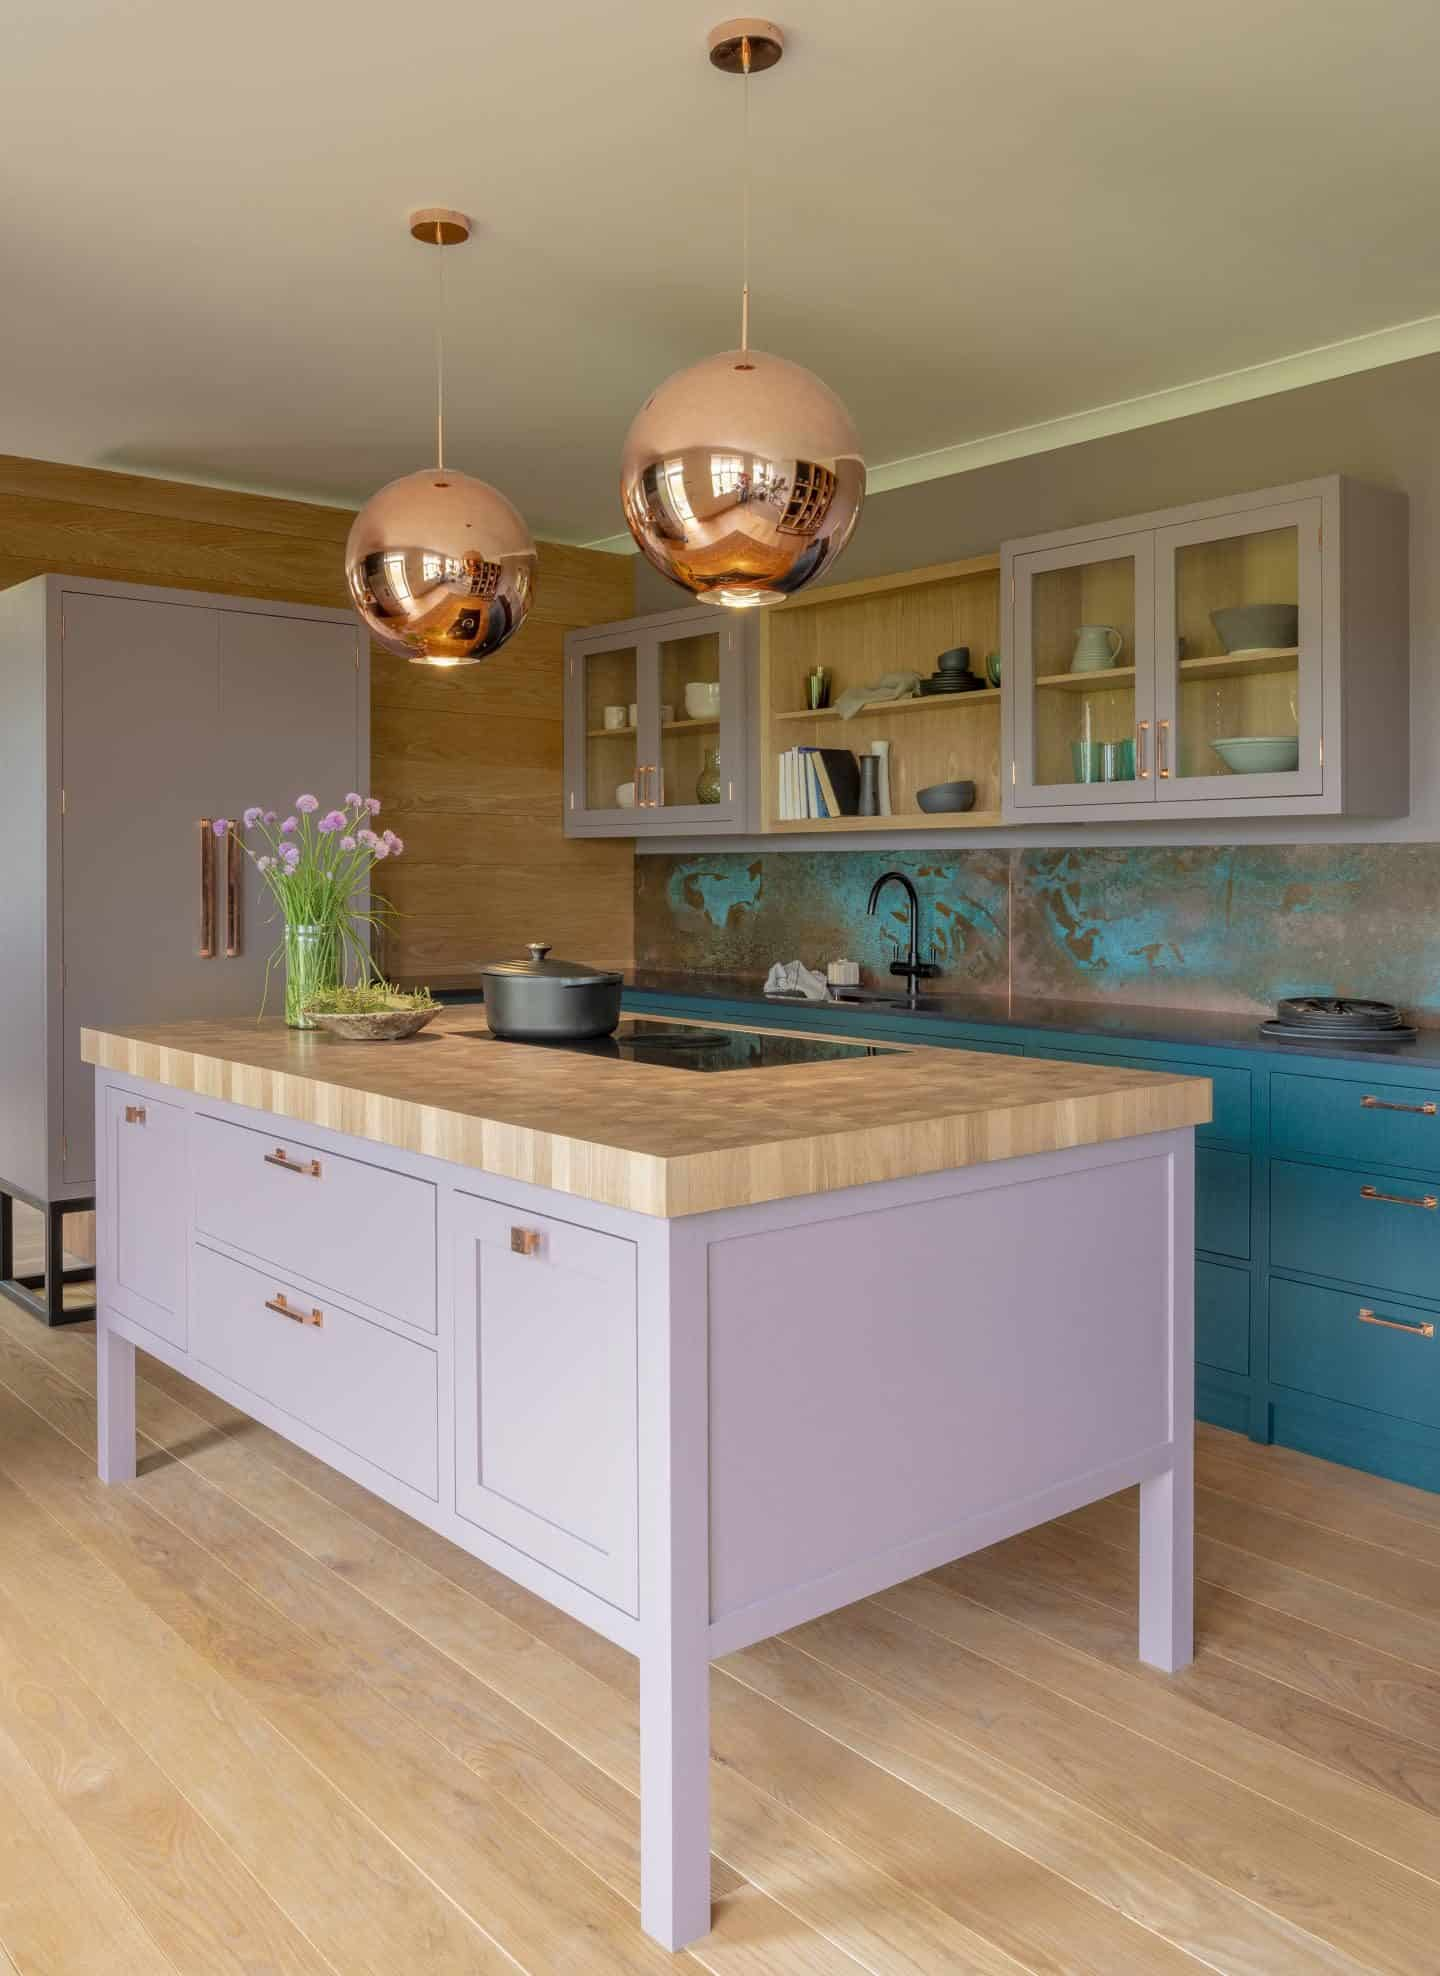 Naked Kitchens - Hampton Court Kitchen